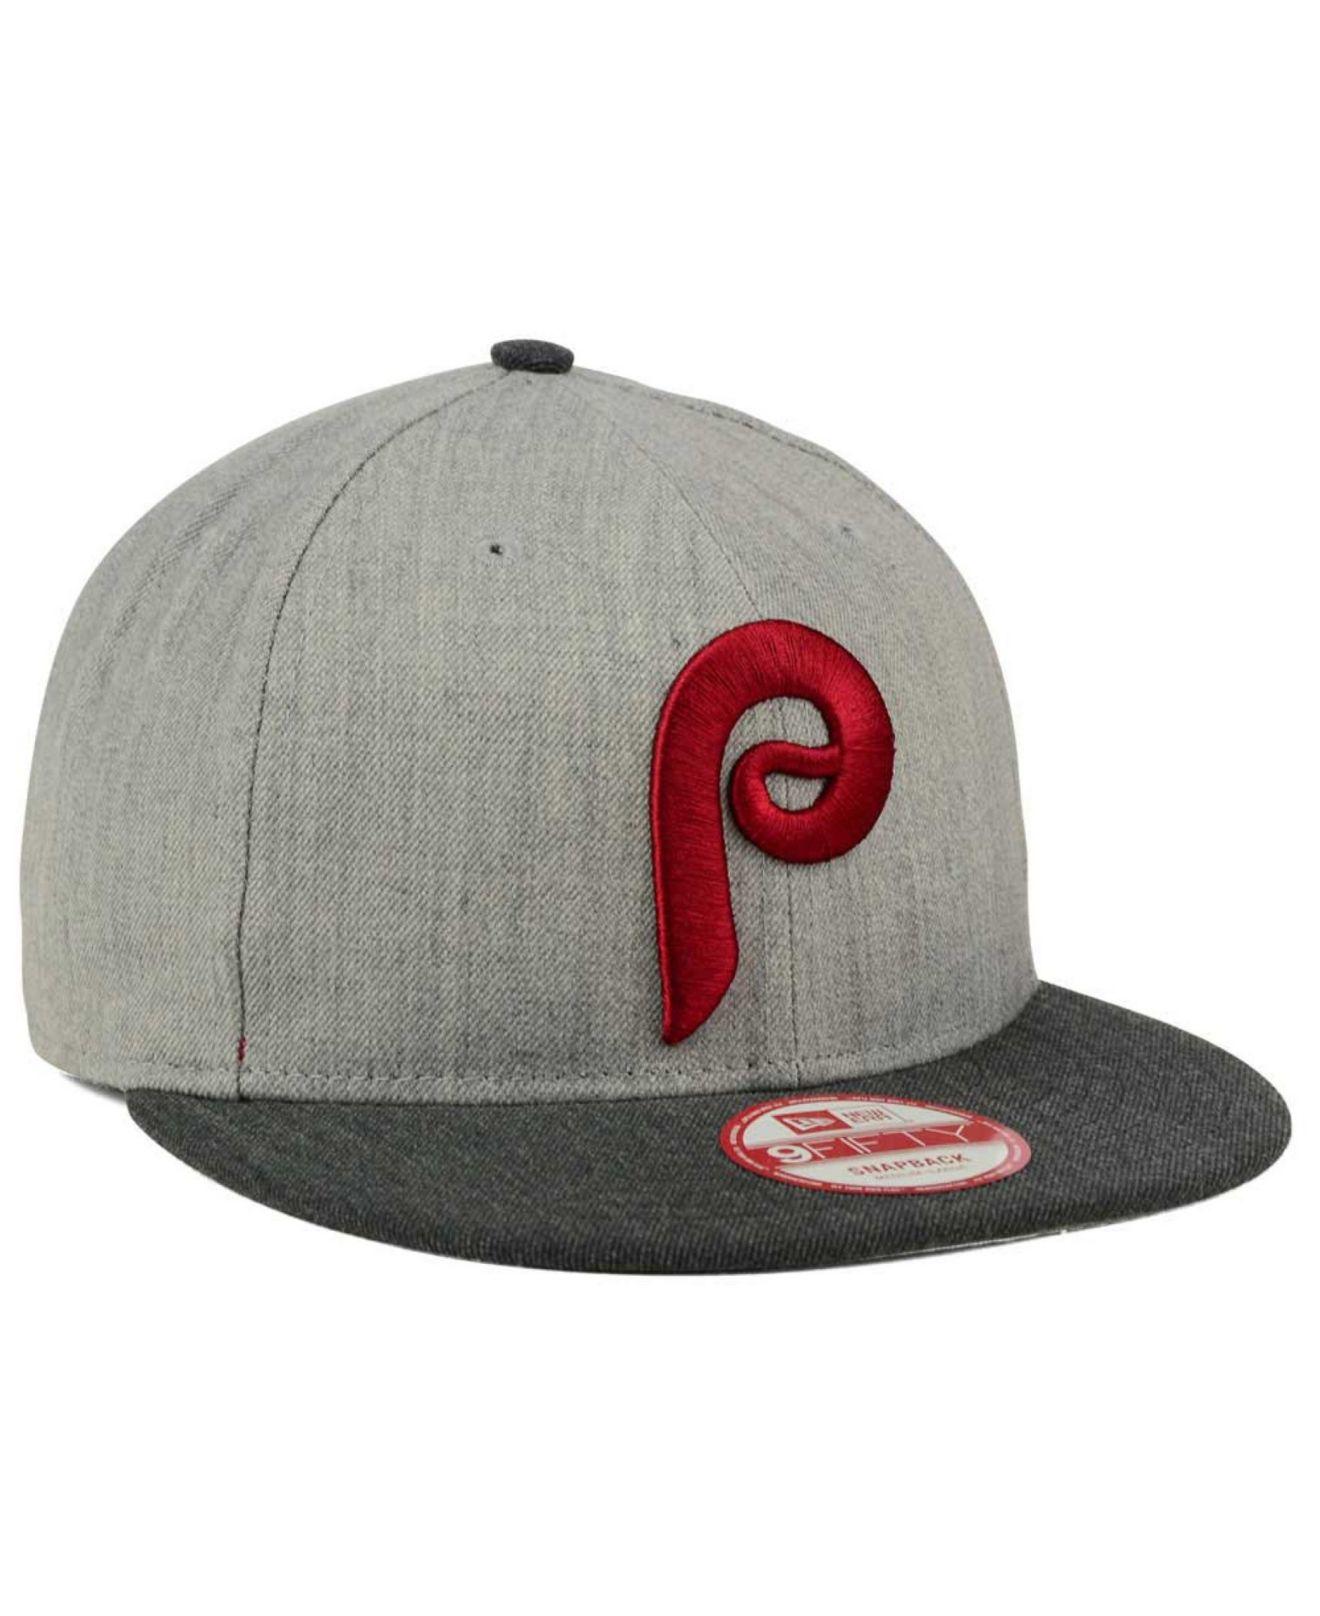 fcbecbf0bc0d3 KTZ Philadelphia Phillies Heather Action 9fifty Snapback Cap in Gray ...